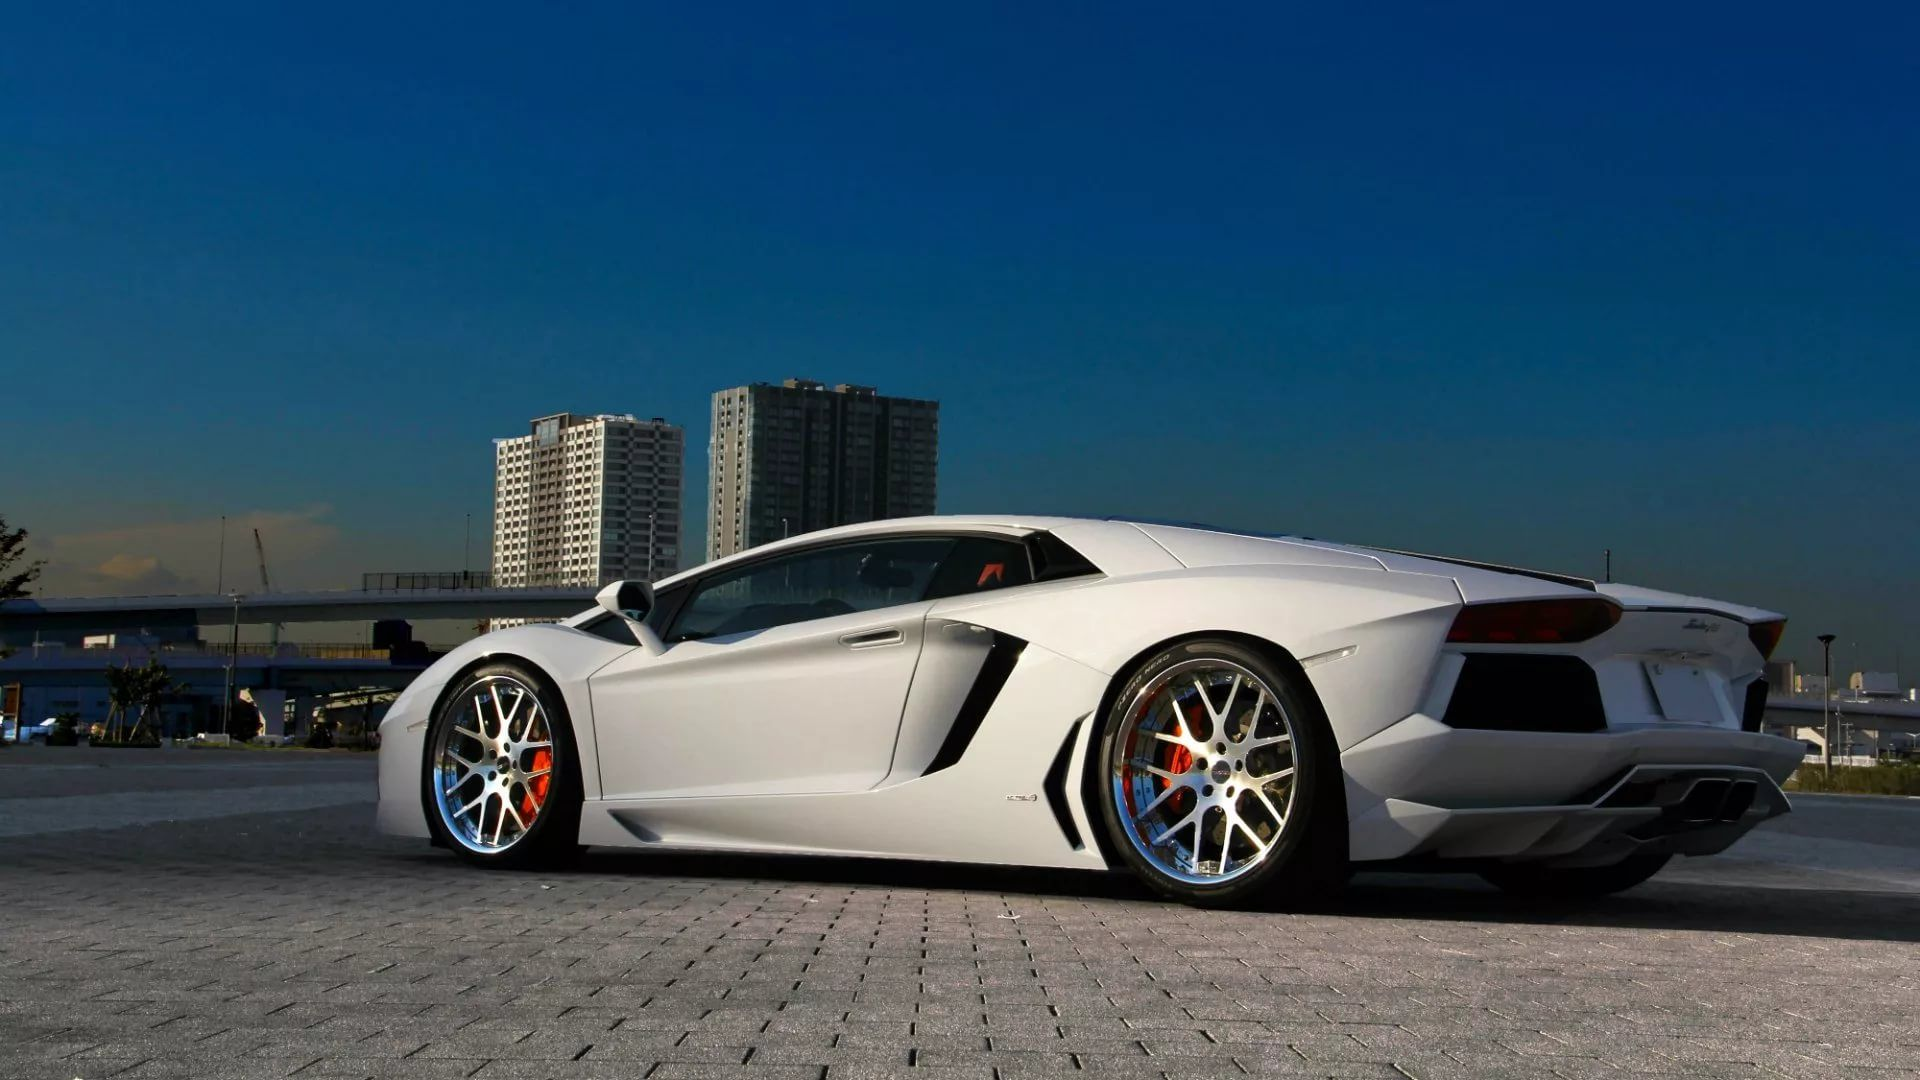 Lamborghini download free wallpaper image search